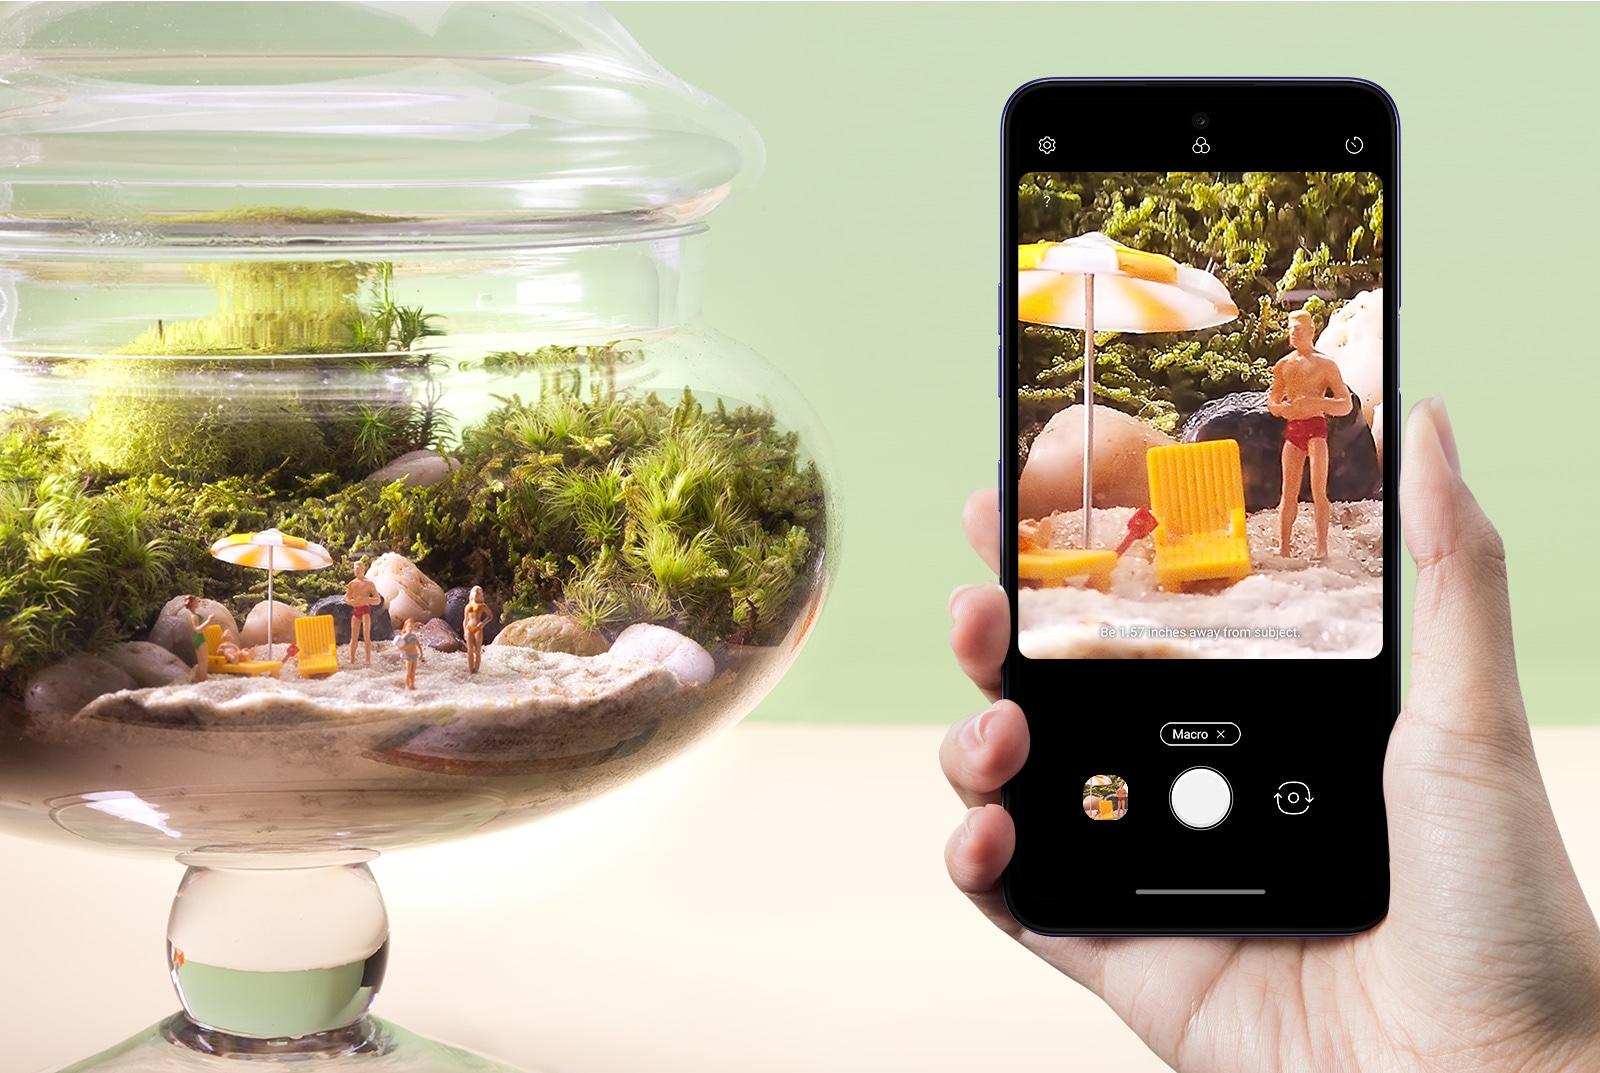 LG K52 使用微距模式拍攝魚缸內的小人偶模型。